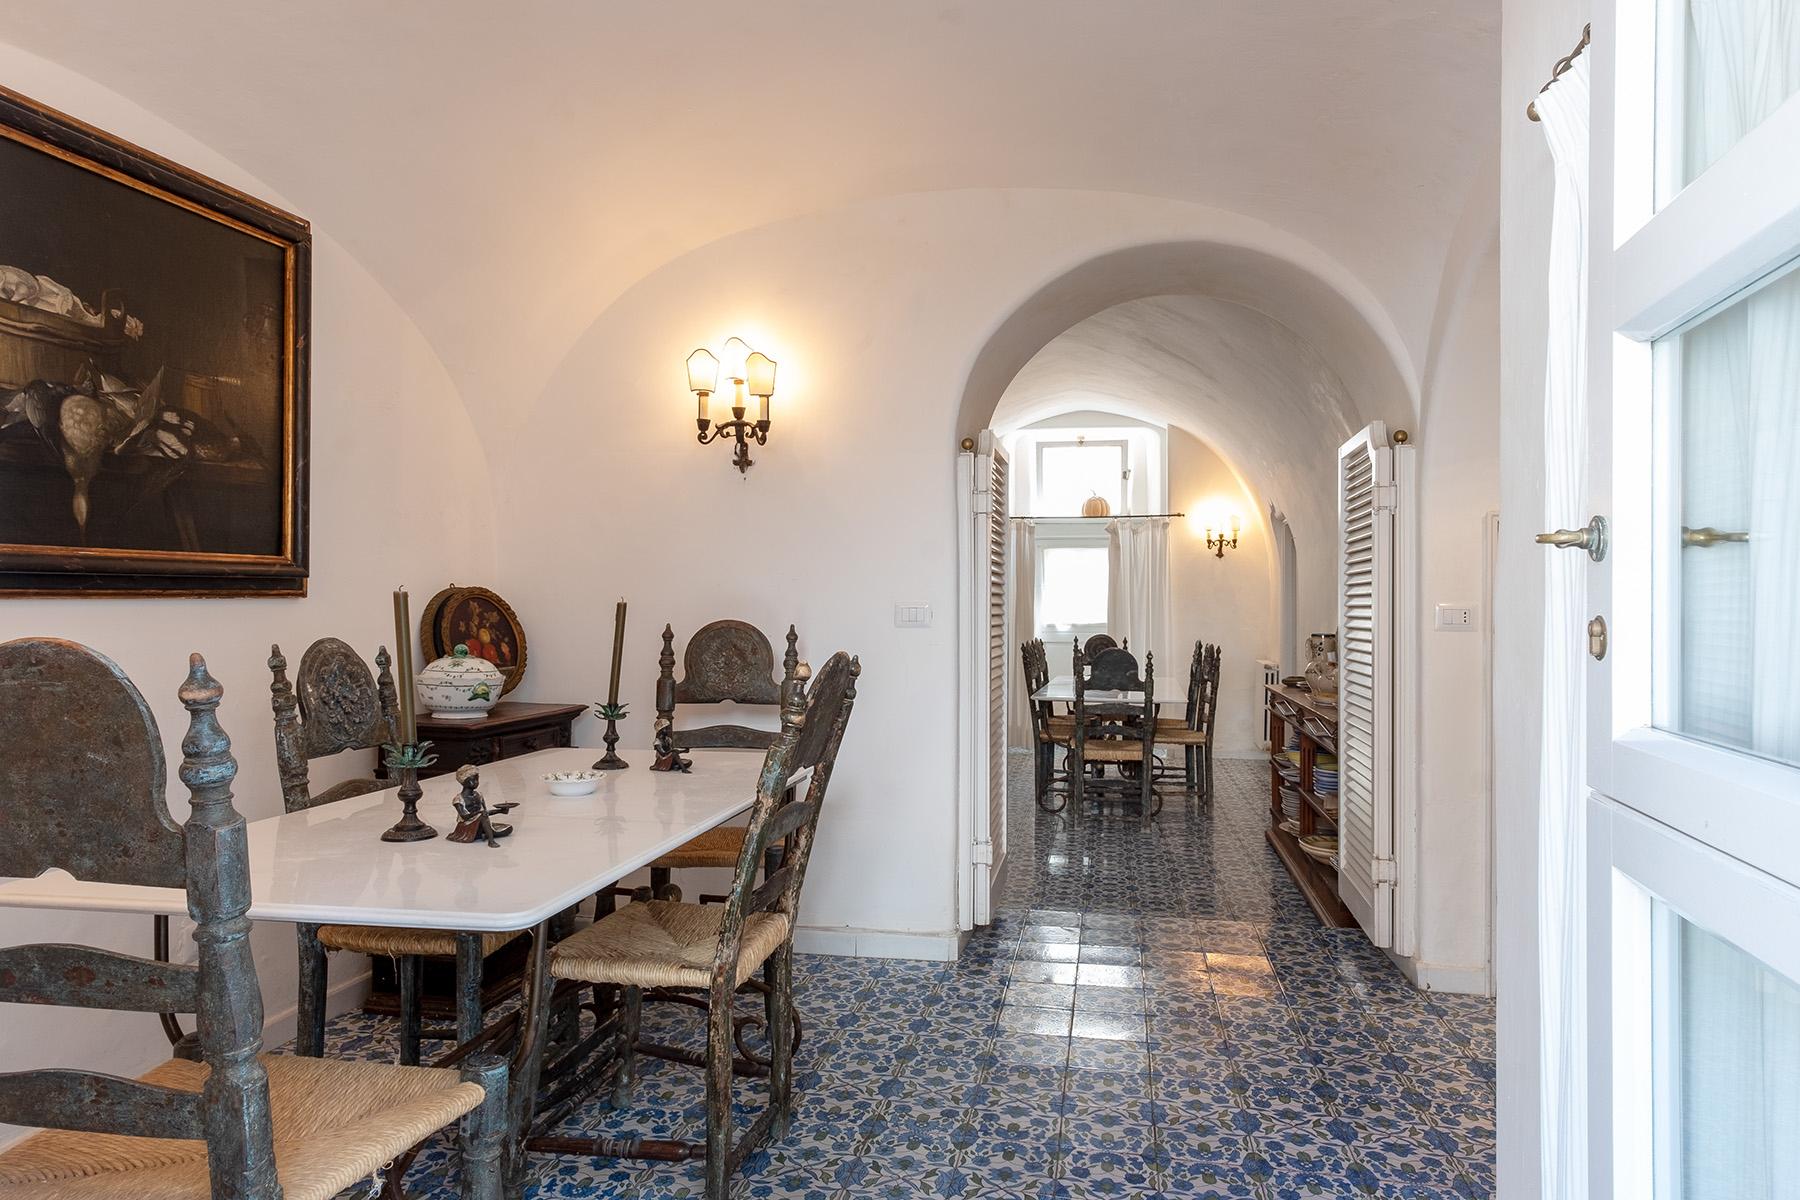 Casa indipendente in Vendita a Capri: 5 locali, 300 mq - Foto 21